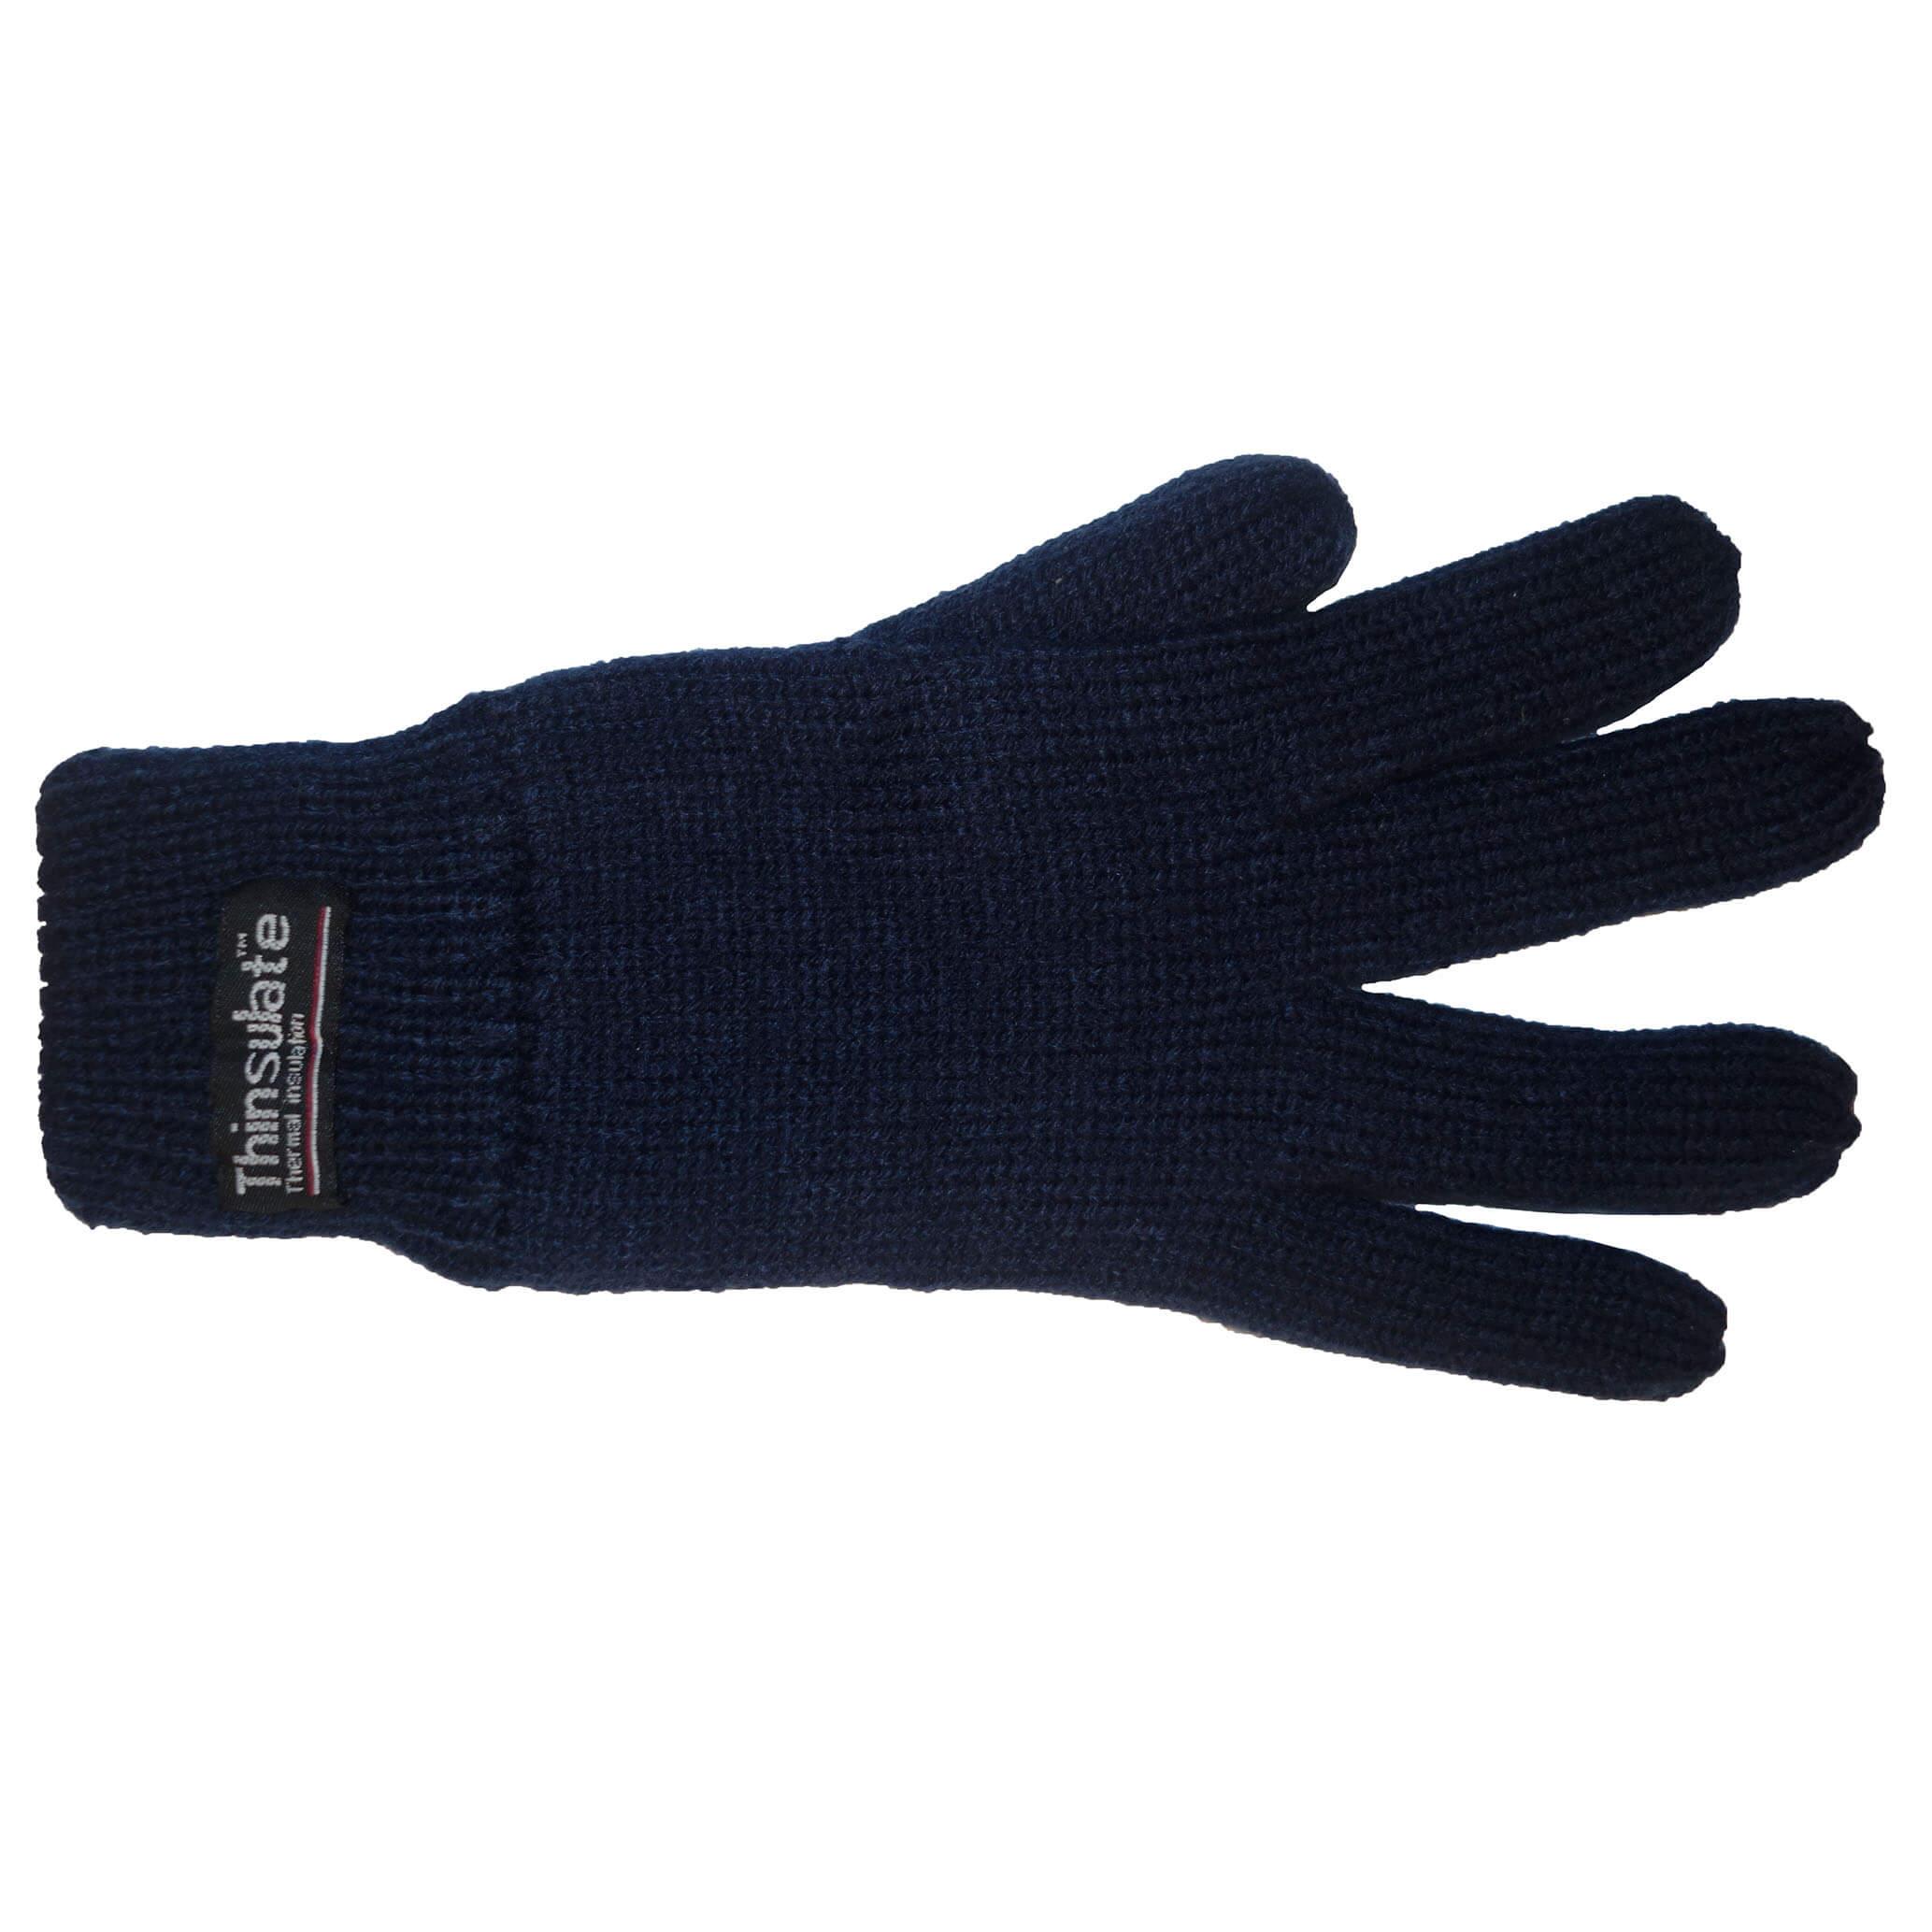 Thinsulate Handschoenen Blauw XXL-0